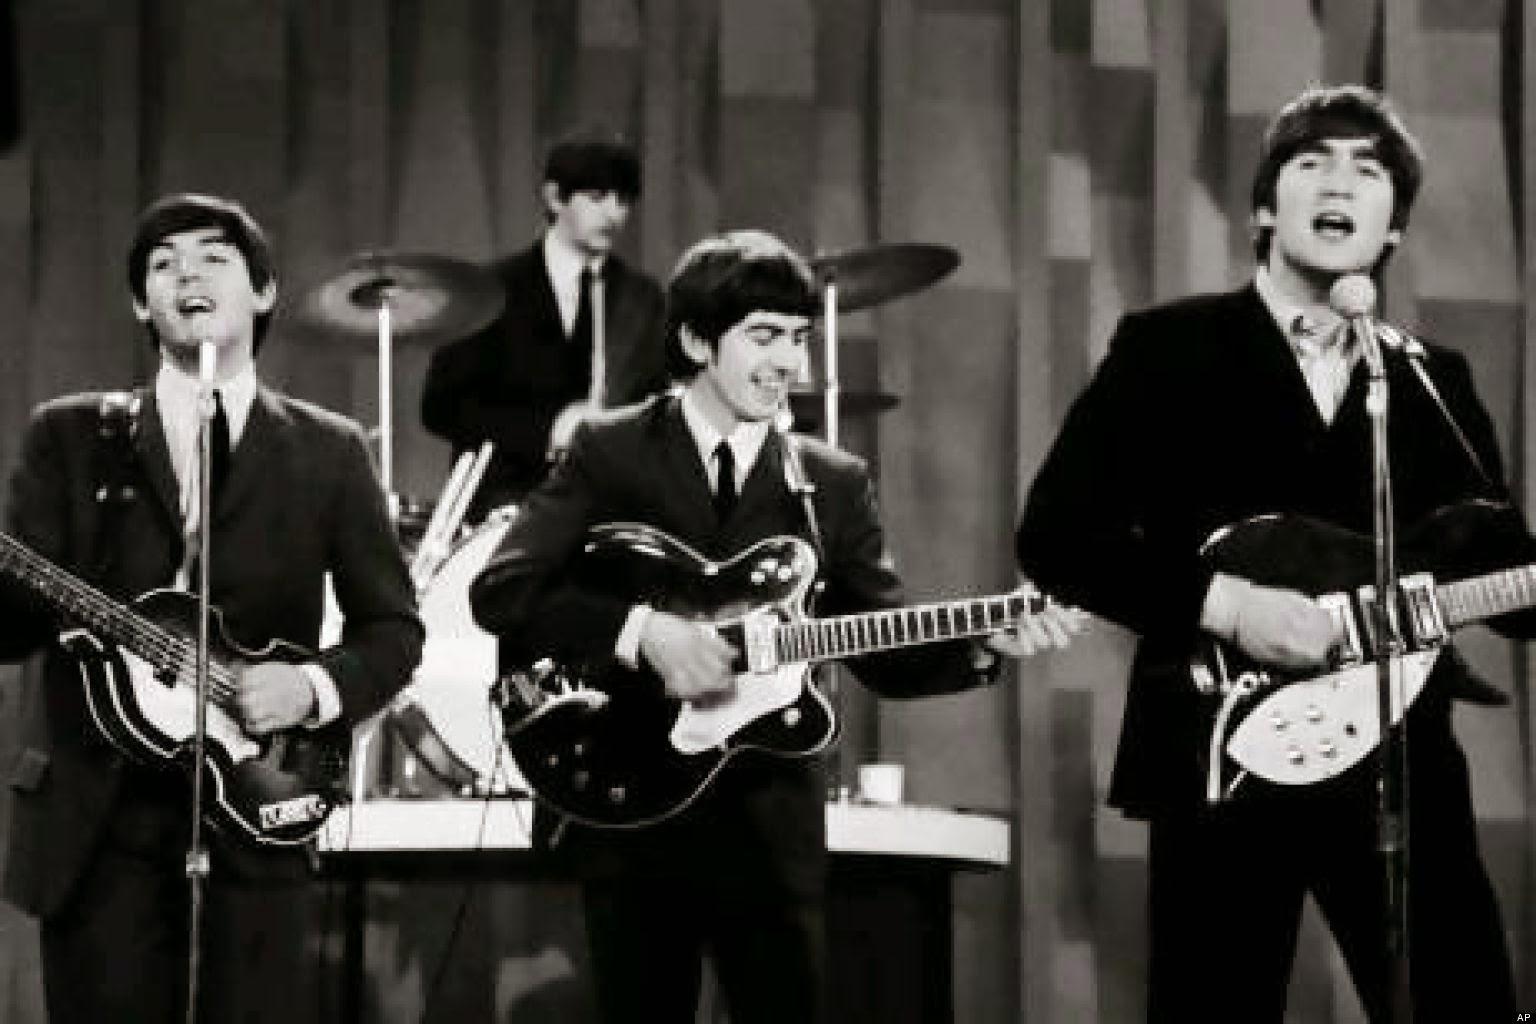 Daftar 25 Lagu Terbaik The Beatles